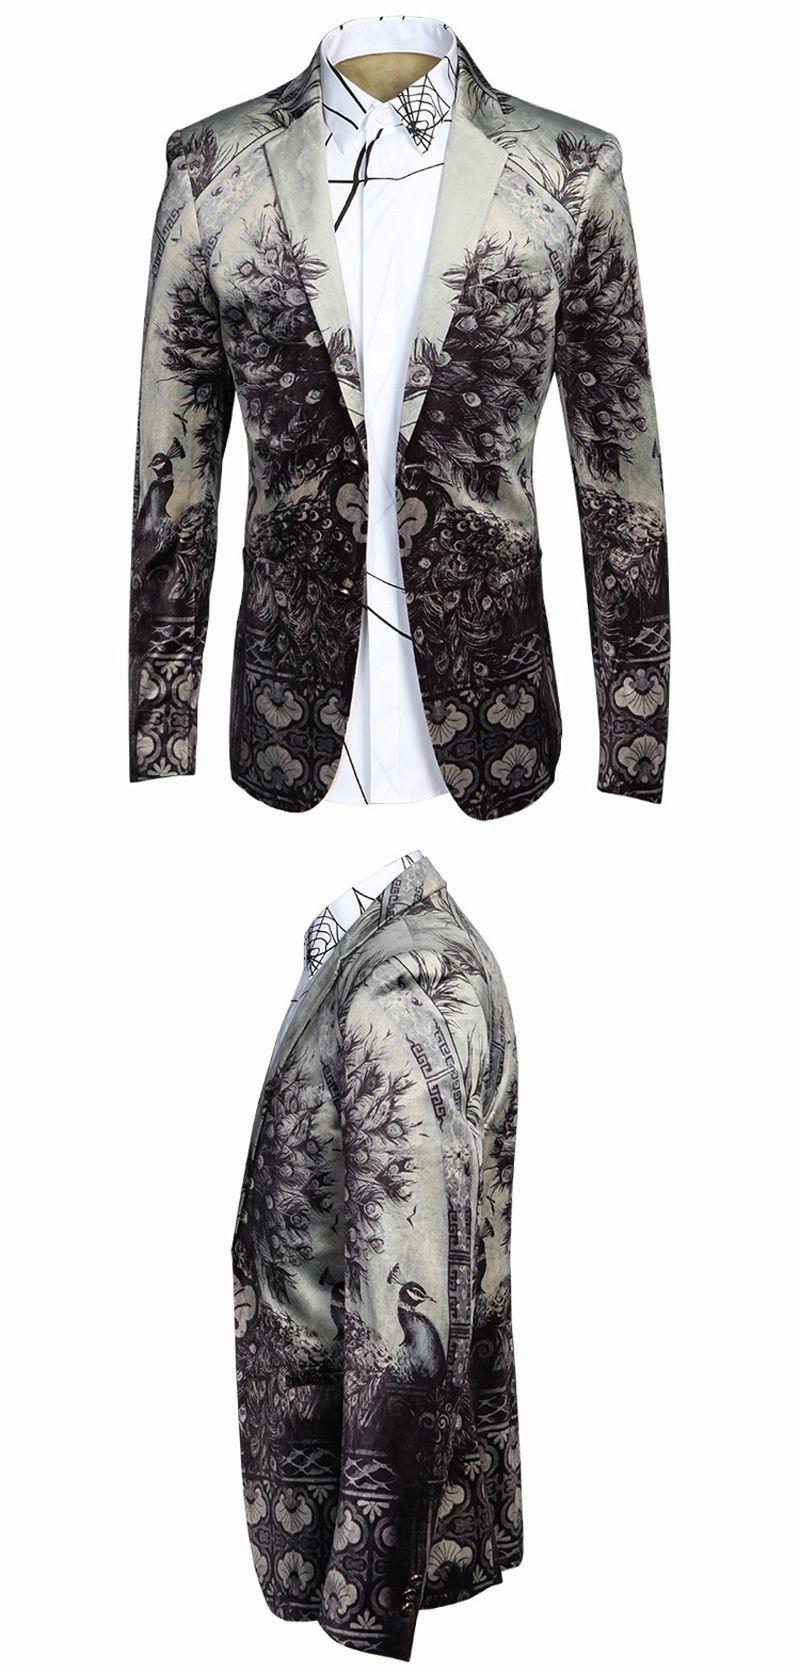 4b330c9e98e Luxury Blazer Suit Jacket Men 2016 Brand Slim Fit Floral Men Blazer Stage  Costume Singers Business